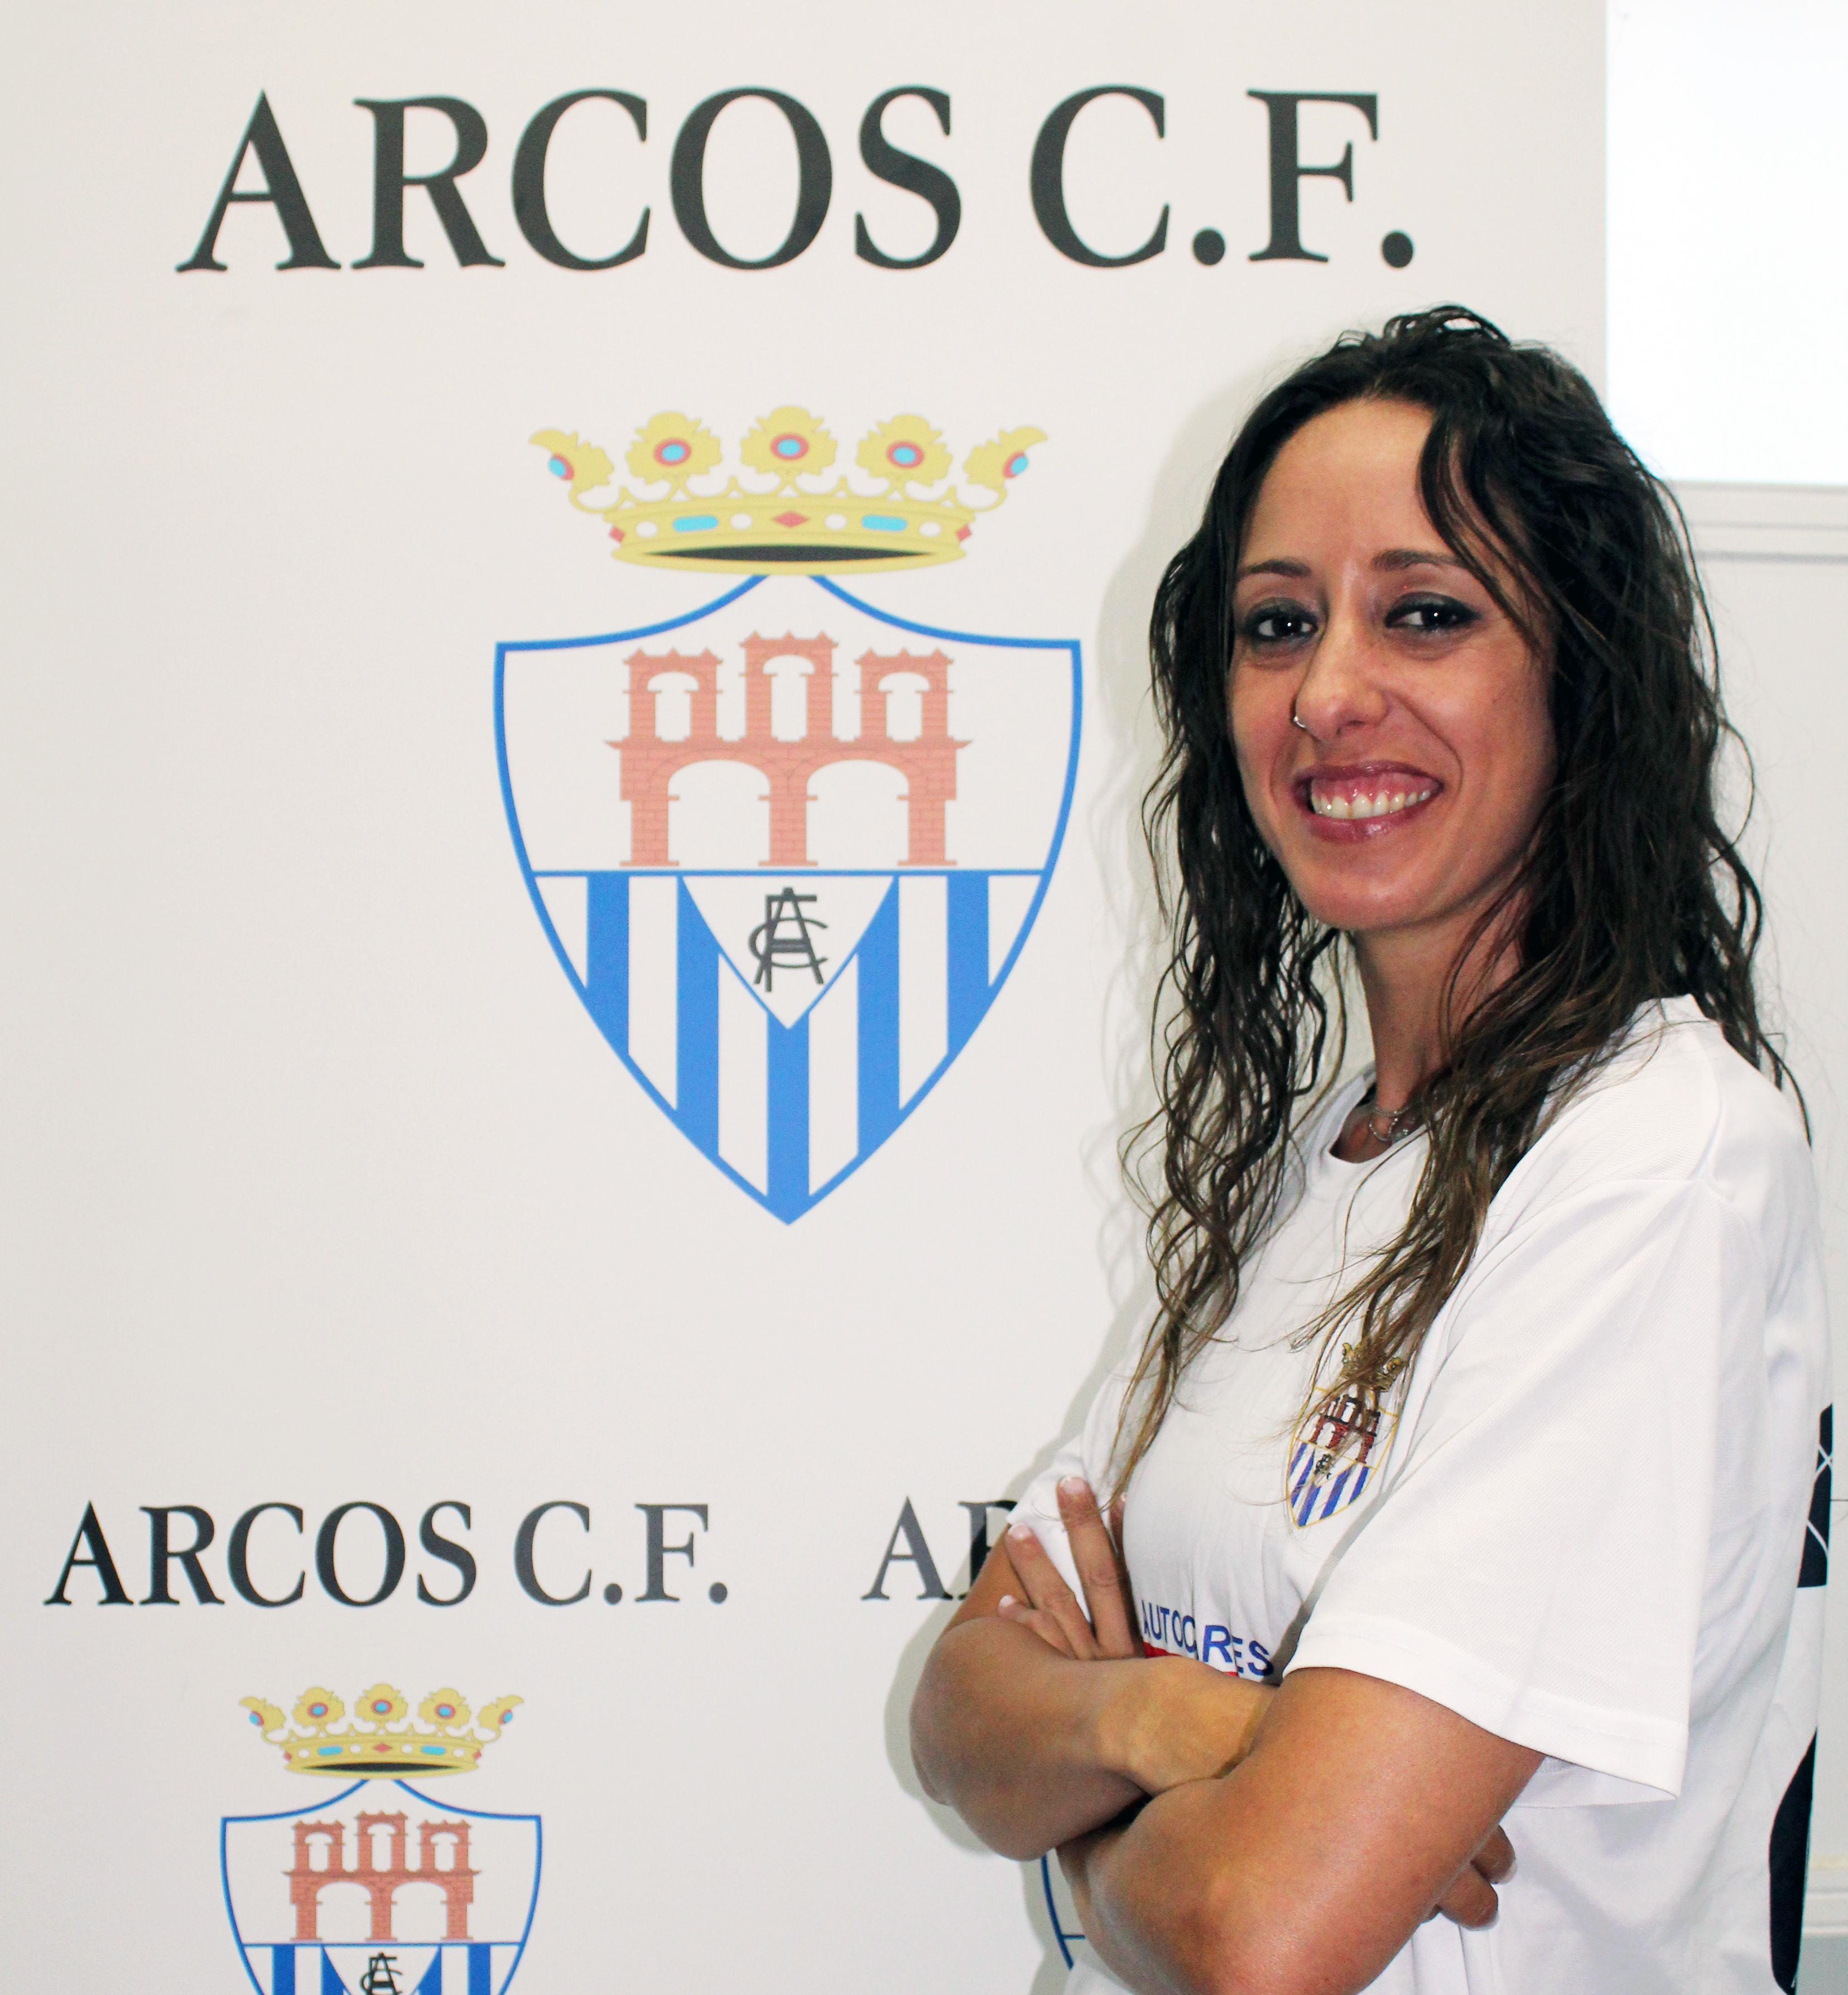 http://arcoscf.es/wp-content/uploads/2017/07/vanesa_badillo_sanchez.jpg